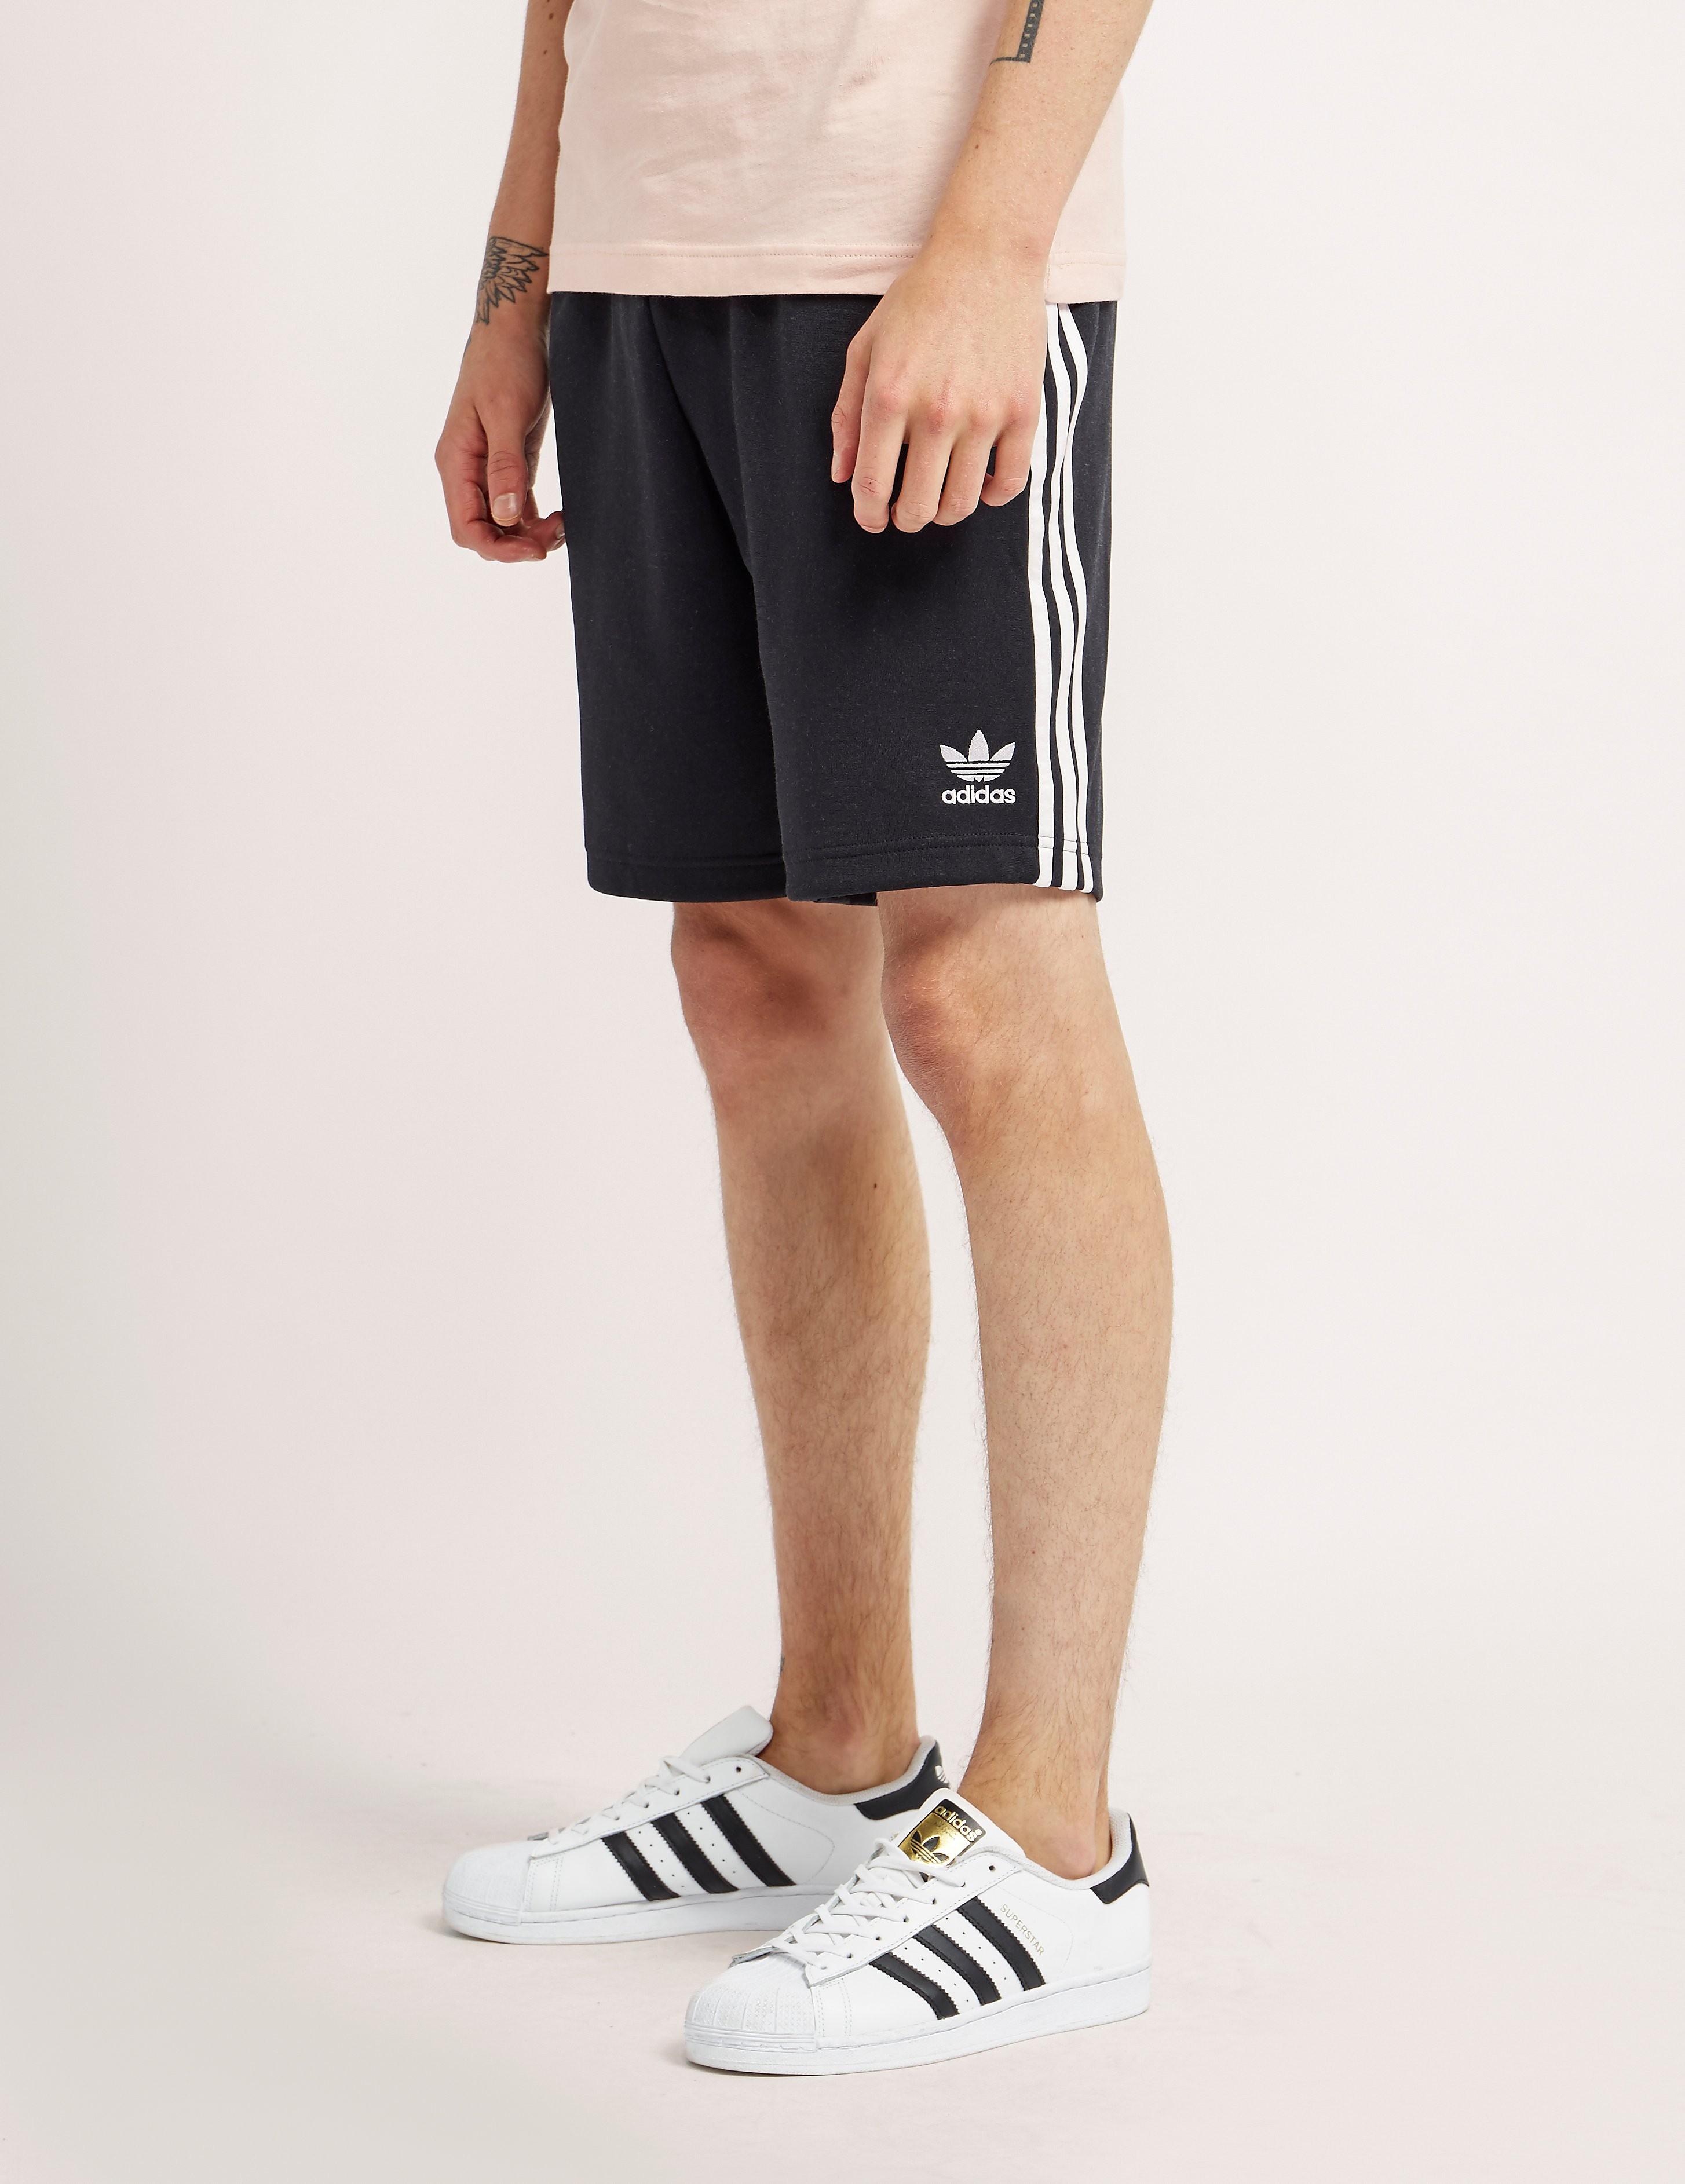 adidas Originals Superstar Poly Sports Shorts